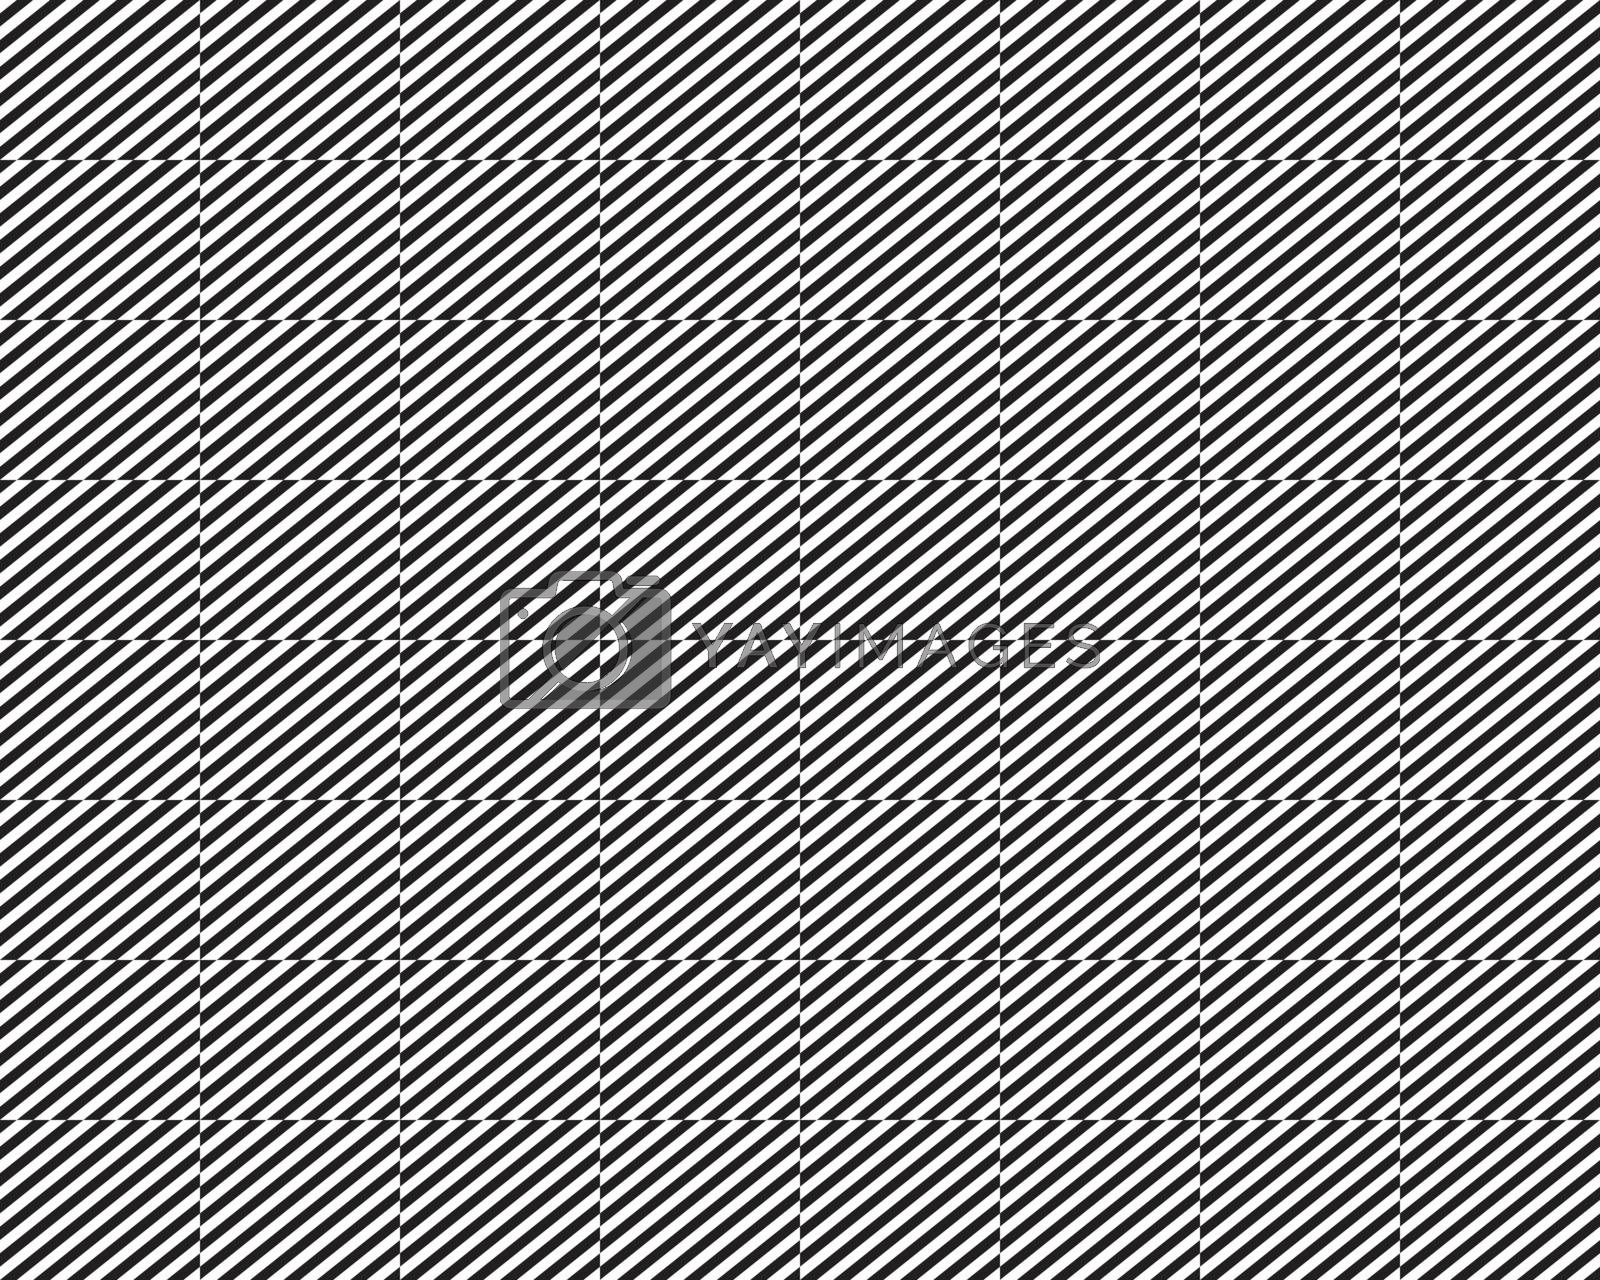 Diagonal lines pattern, seamless decorative background